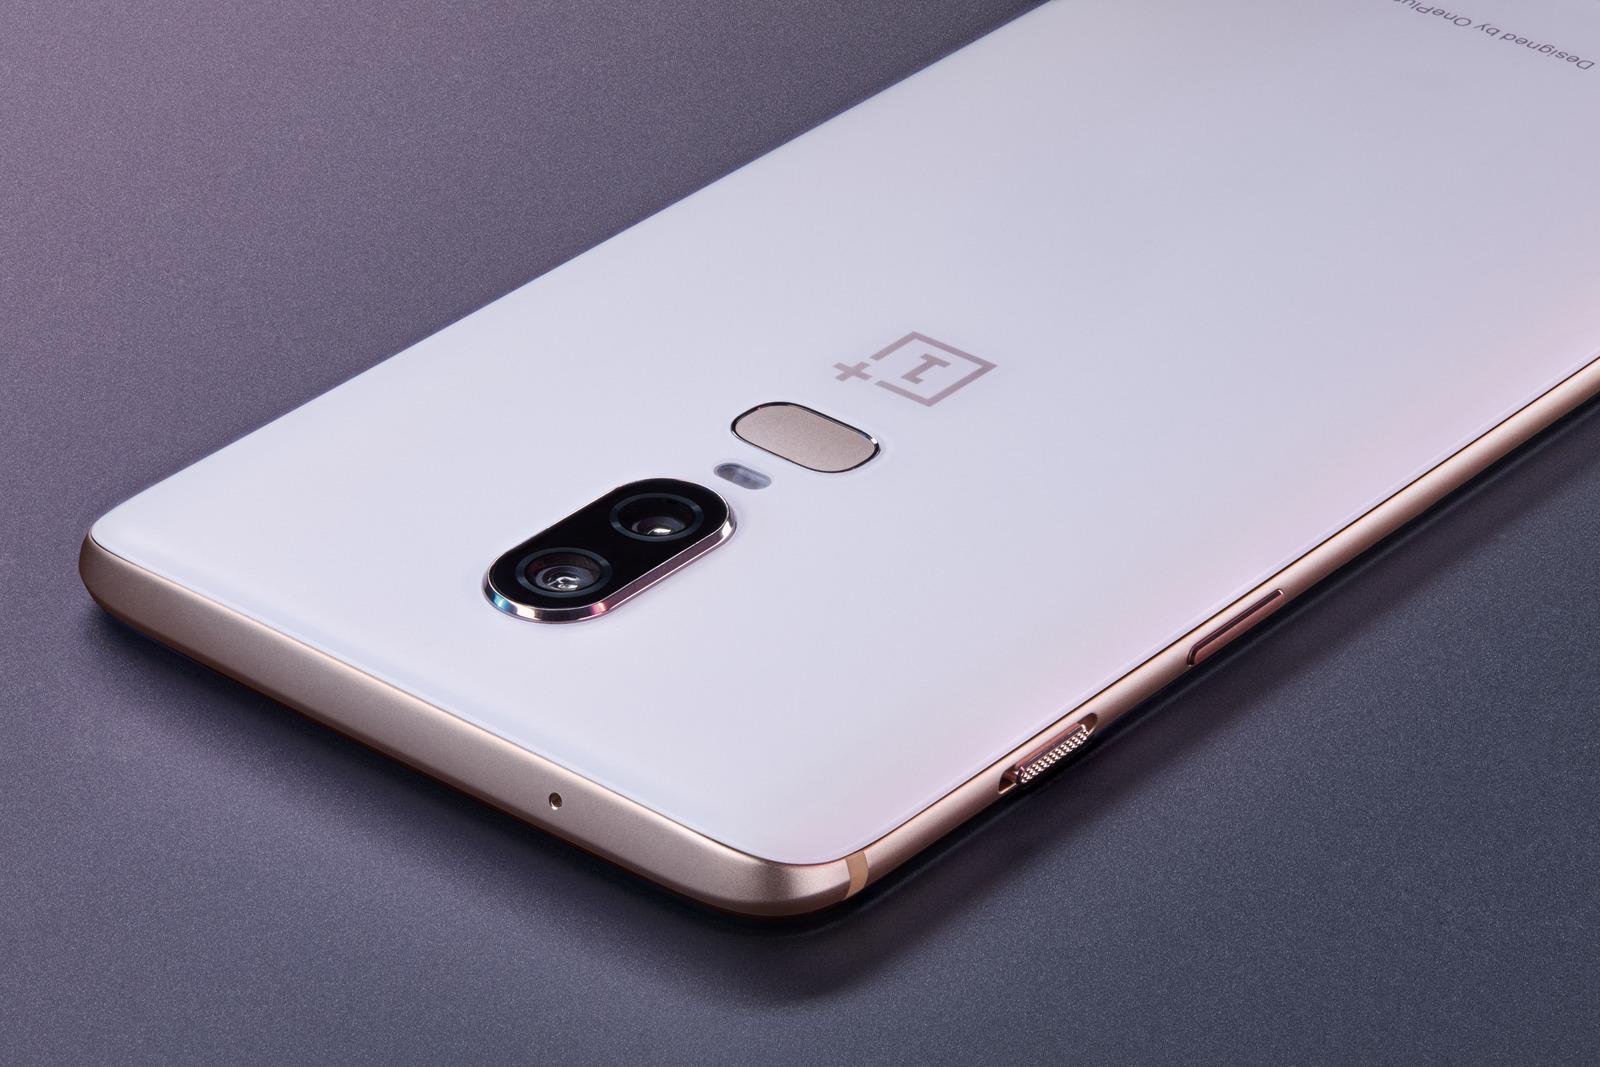 تصميم OnePlus 6